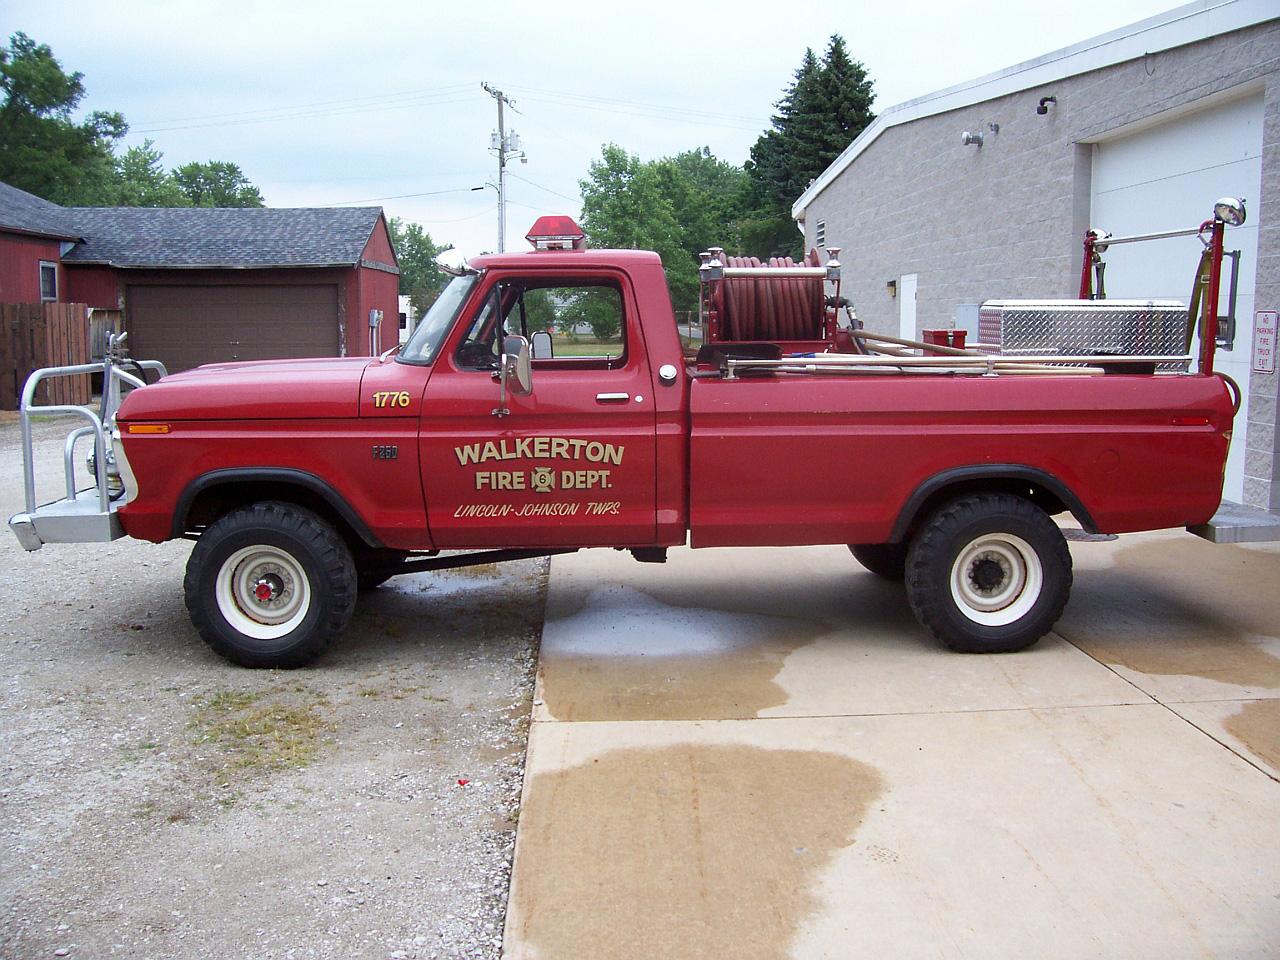 Equipment | Town of Walkerton, Indiana